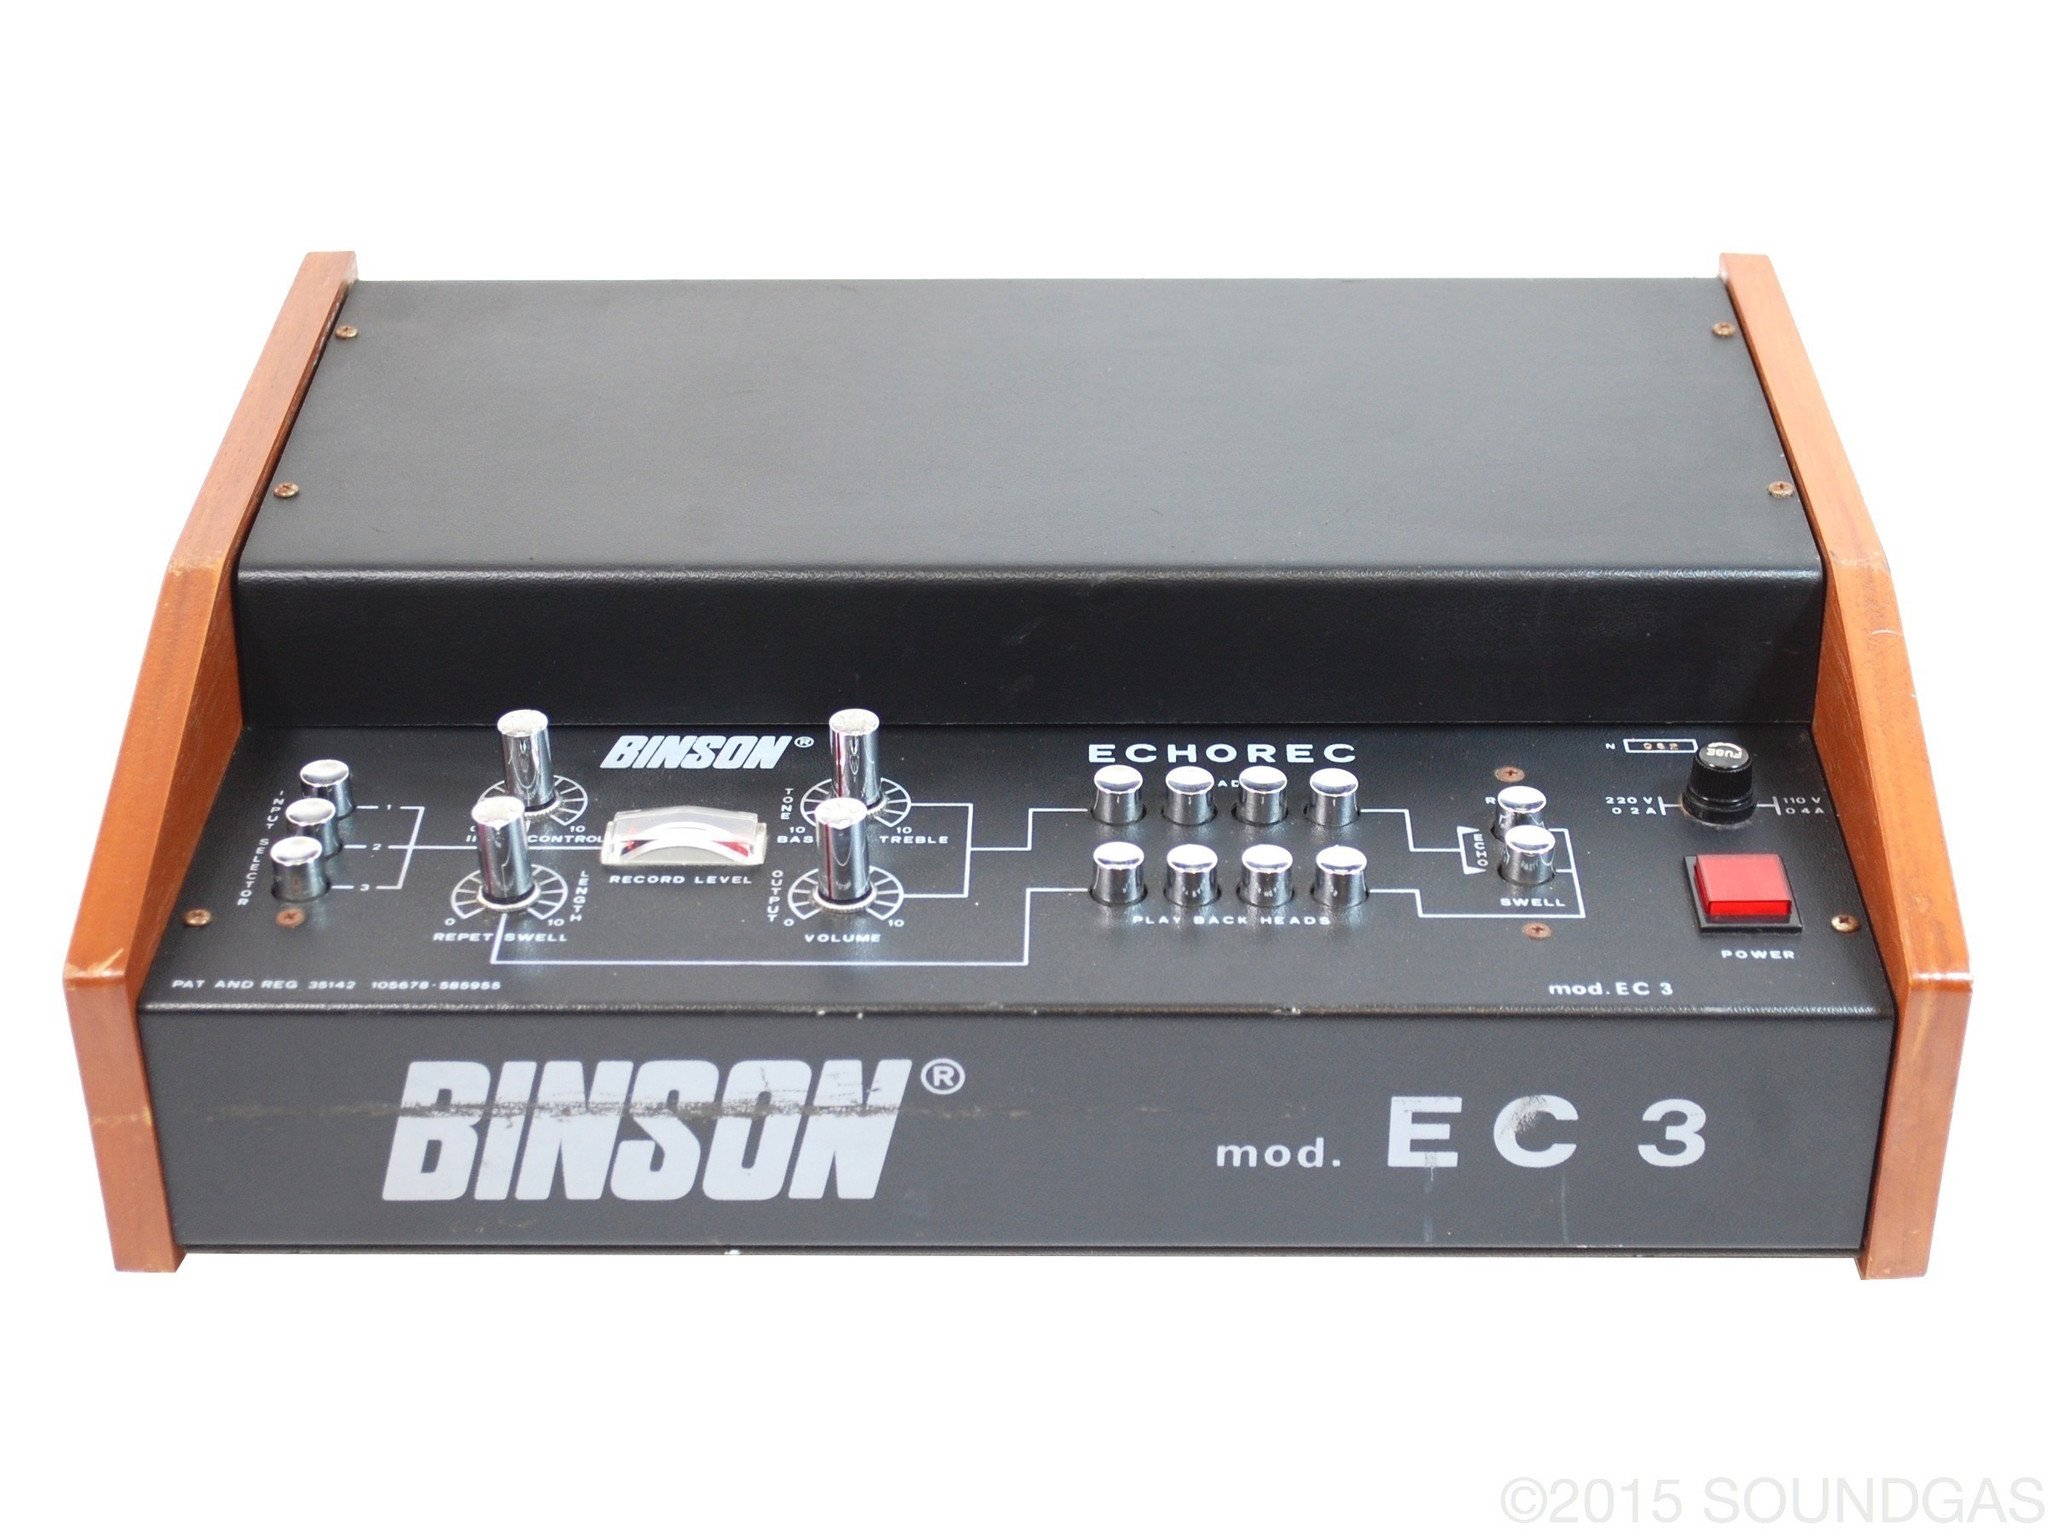 Binson-Echorec-EC3-Solid-State-Disc-Echo-Cover-1